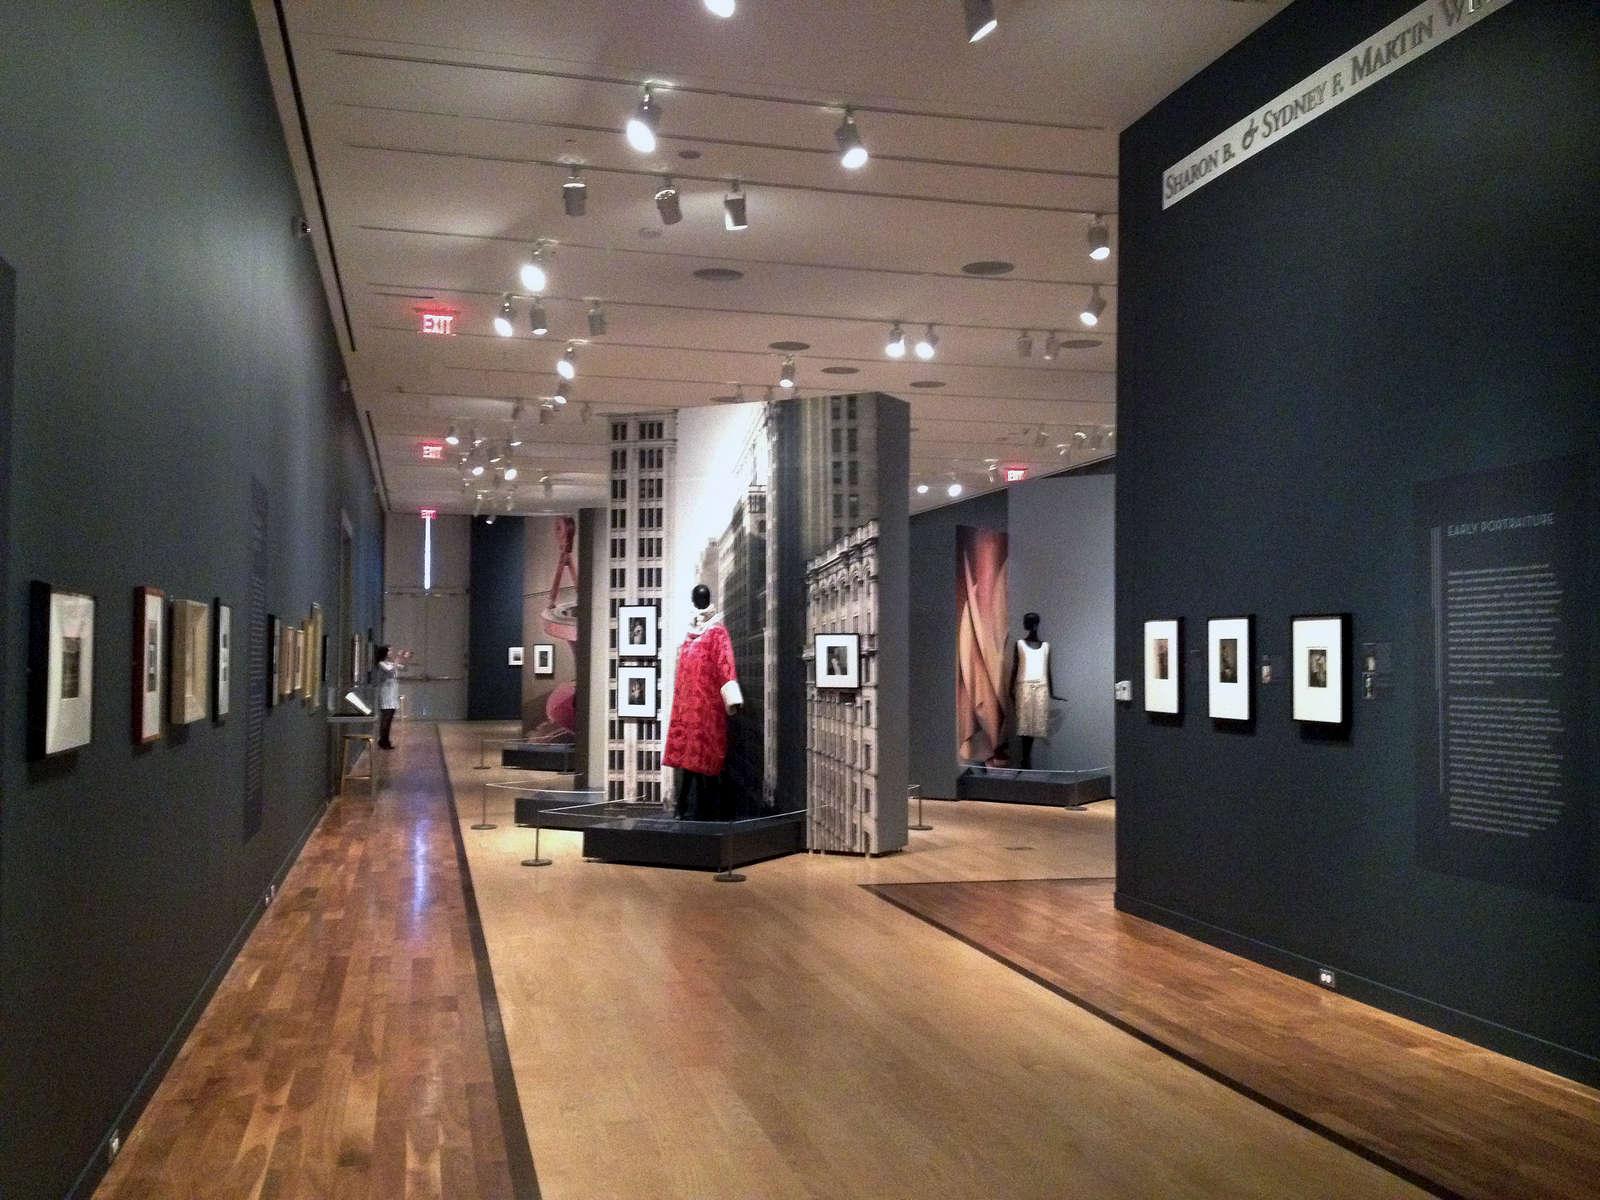 IKD's Sheeler Exhibtion @ the Michener Art Museum